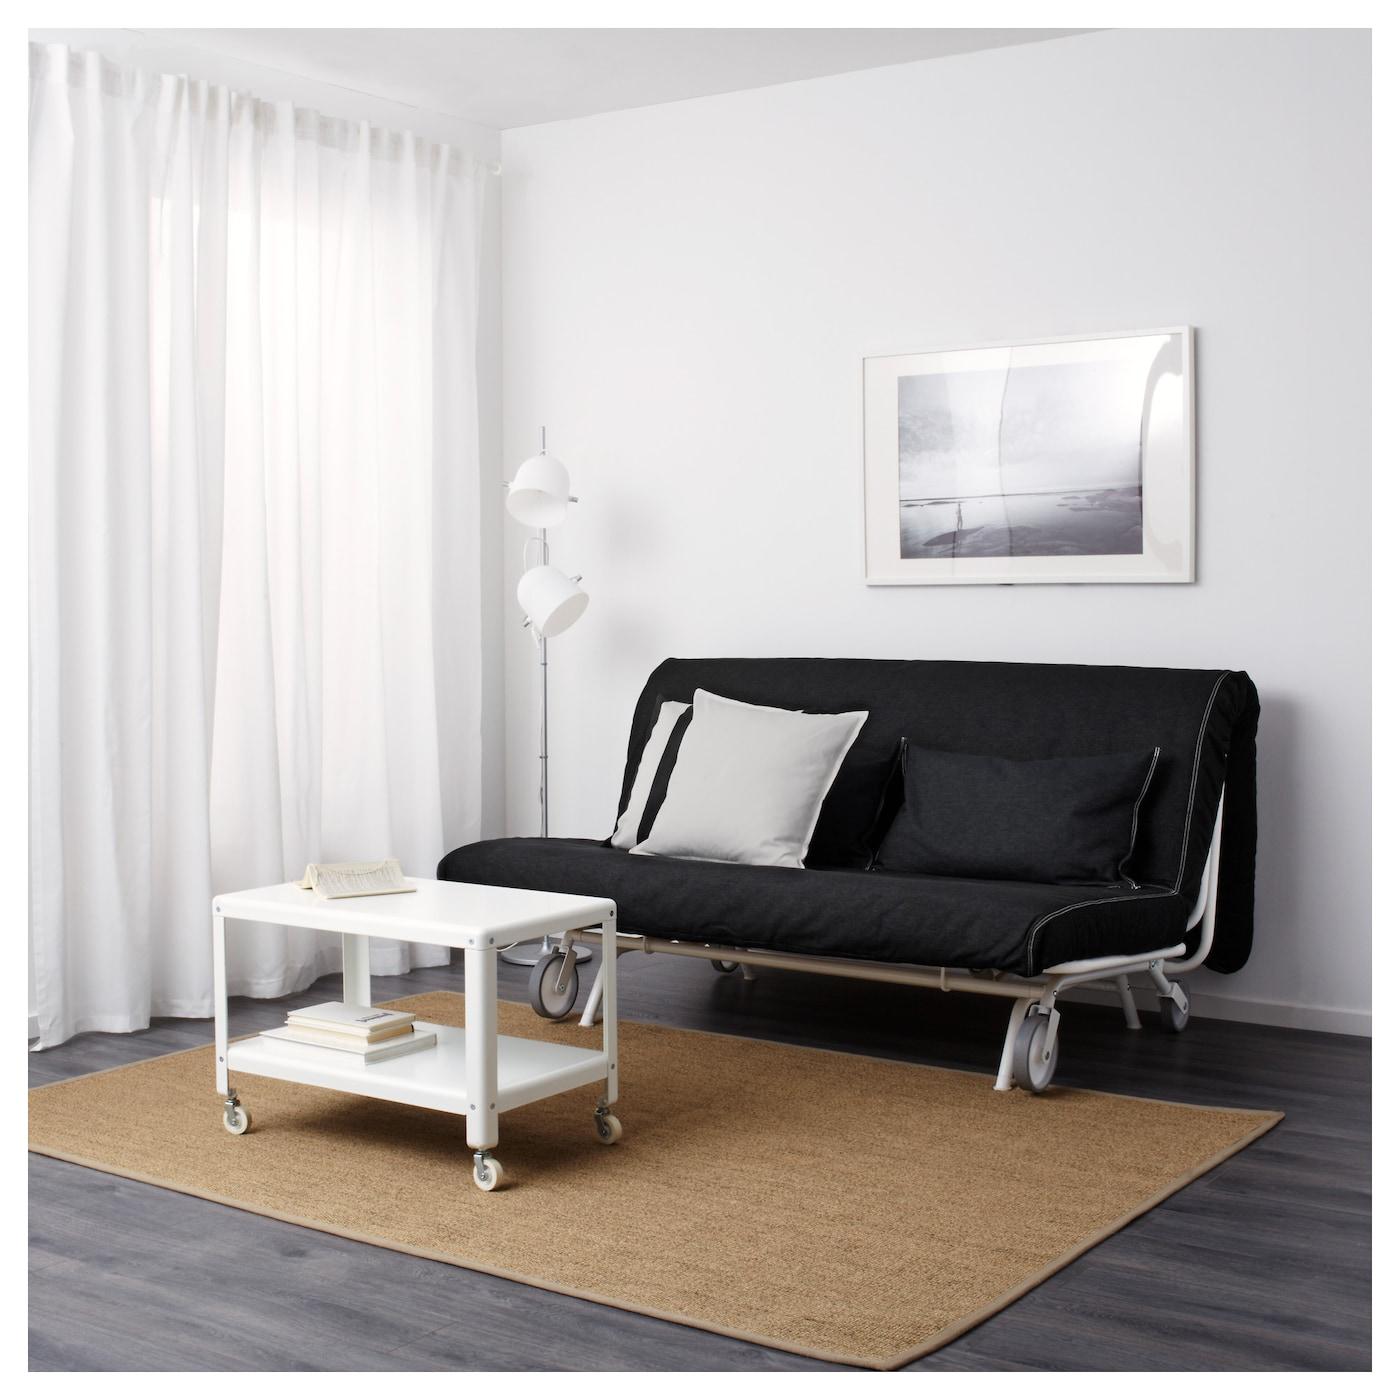 ikea ps l v s two seat sofa bed vansta black ikea. Black Bedroom Furniture Sets. Home Design Ideas